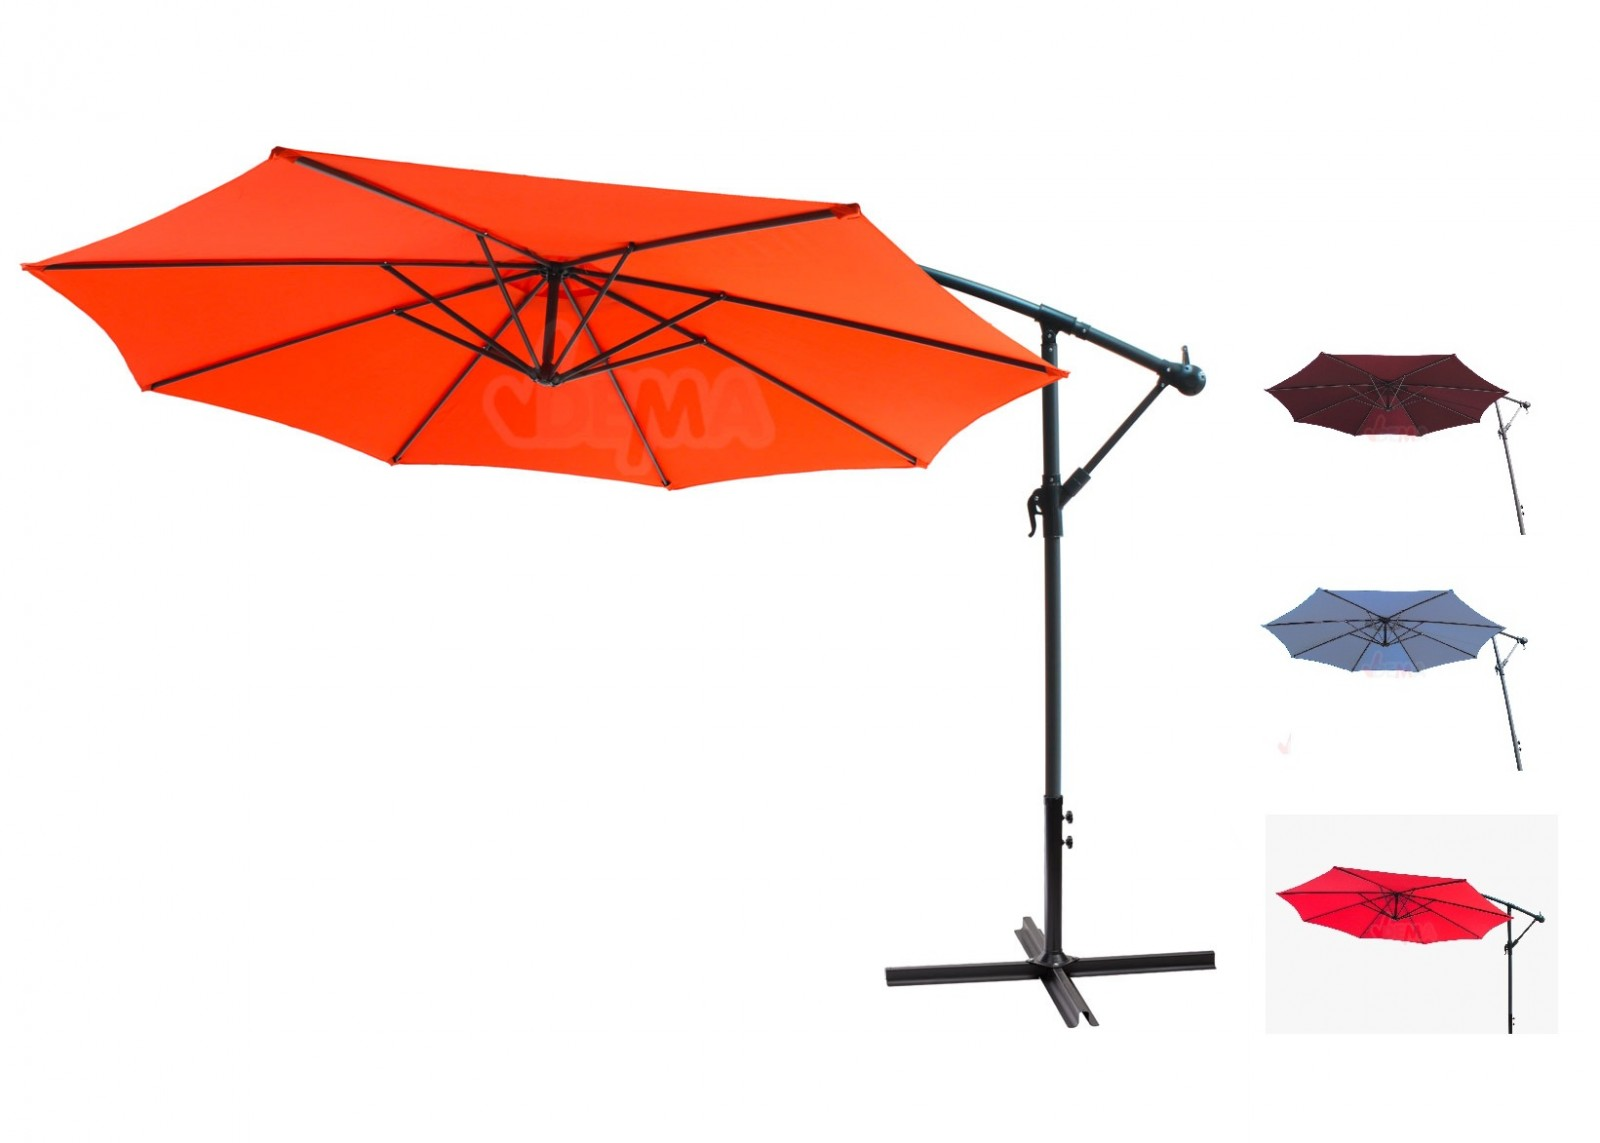 dema ampelschirm sonnenschirm rot hellblau orange. Black Bedroom Furniture Sets. Home Design Ideas